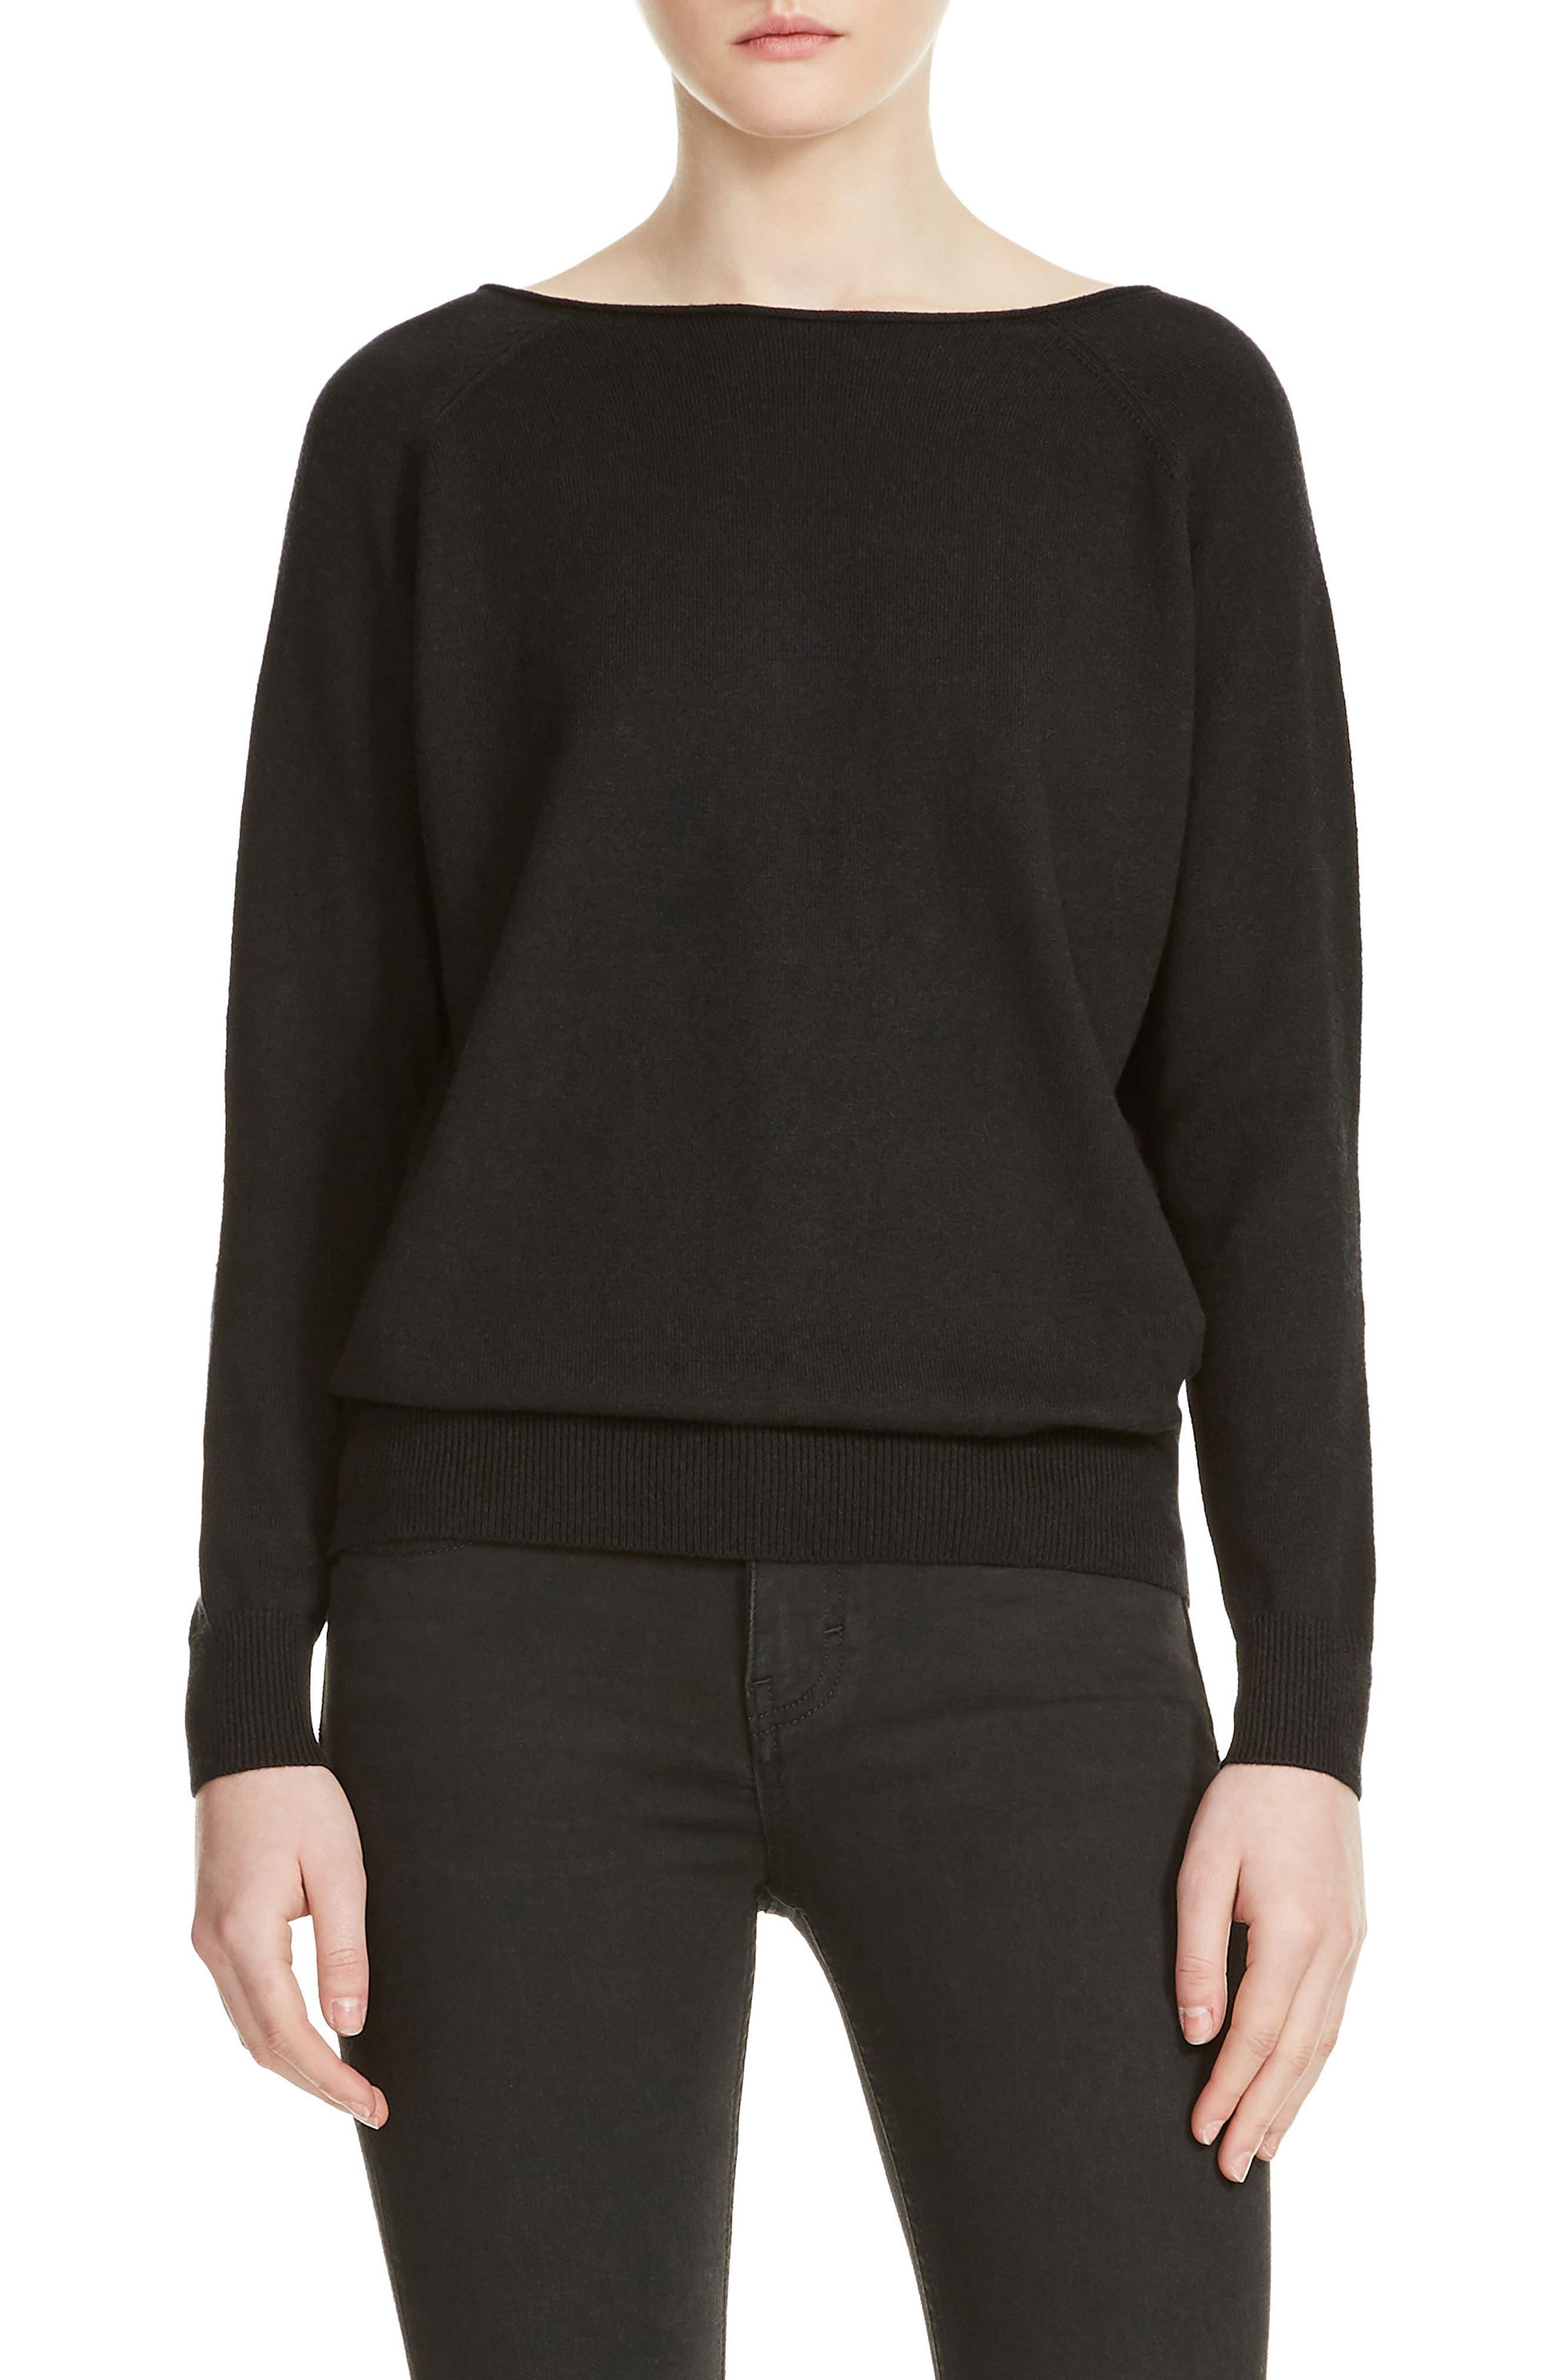 Macademia Chain Back Sweater,                             Main thumbnail 1, color,                             001